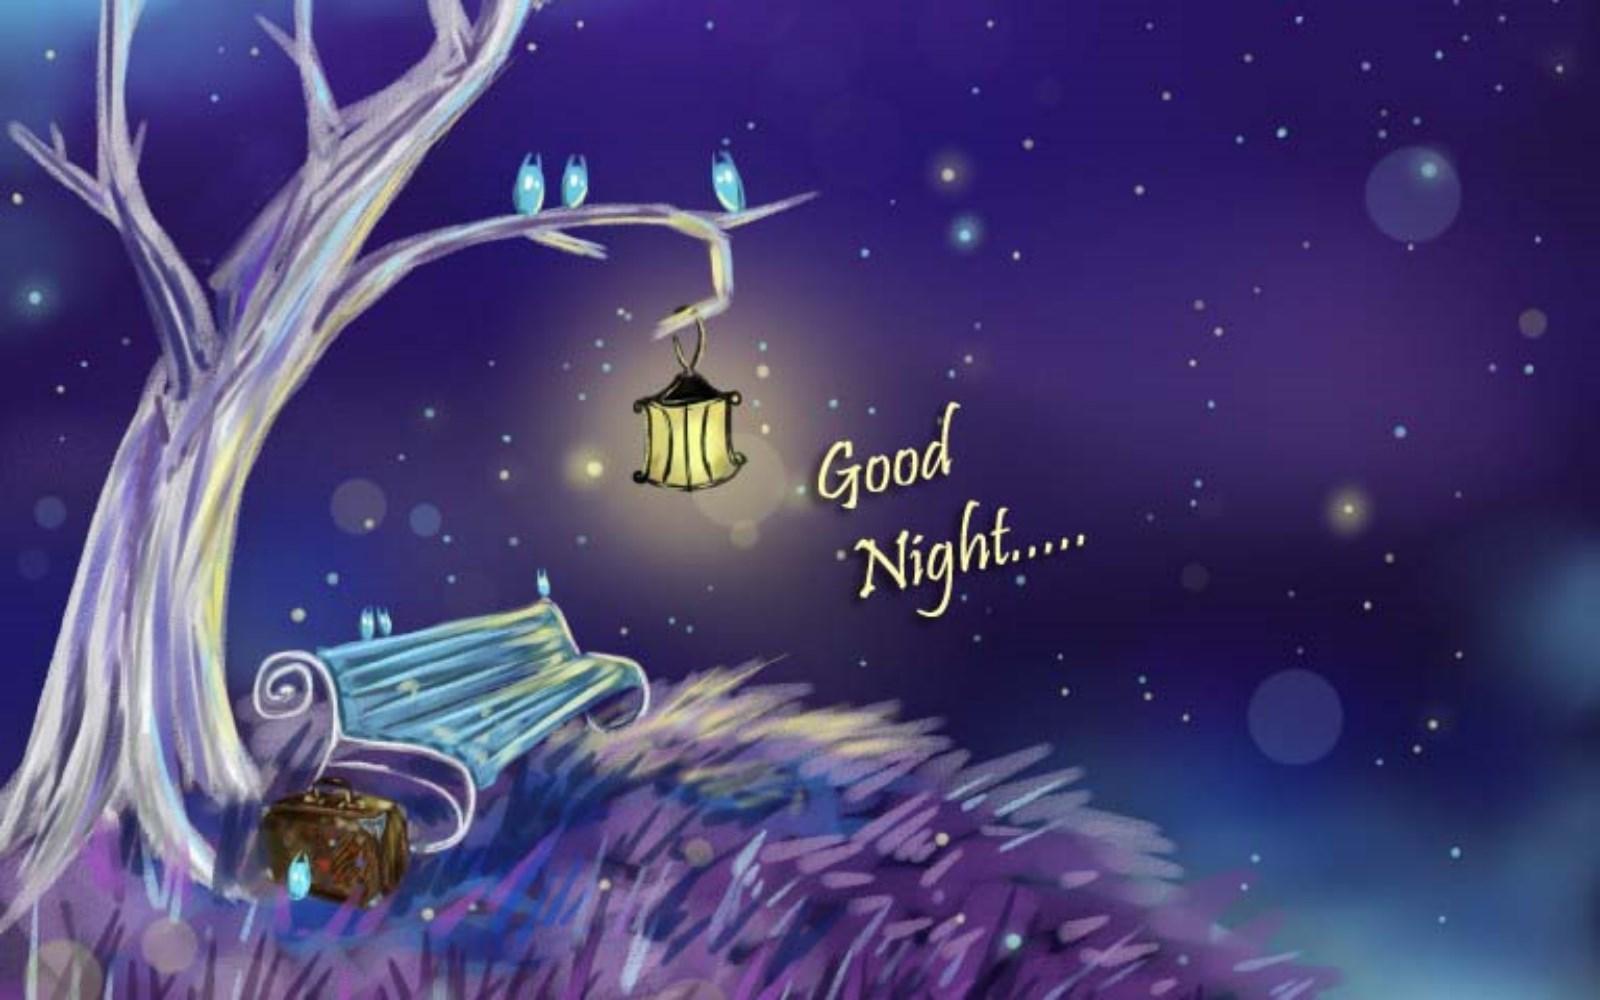 77+] Good Night Wallpapers on WallpaperSafari